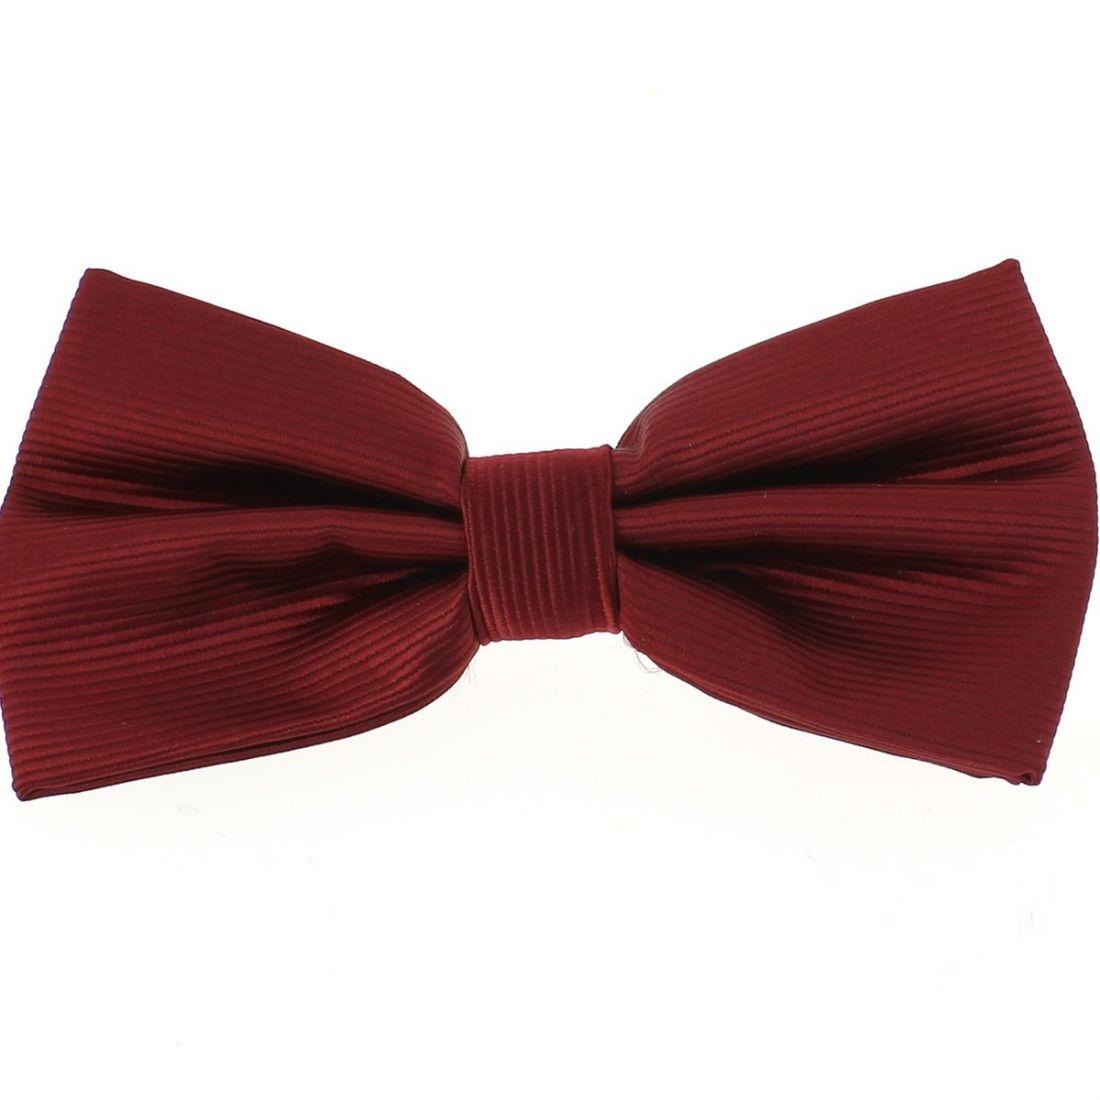 noeud papillon clj vigneron rouge bordeaux clj charles. Black Bedroom Furniture Sets. Home Design Ideas